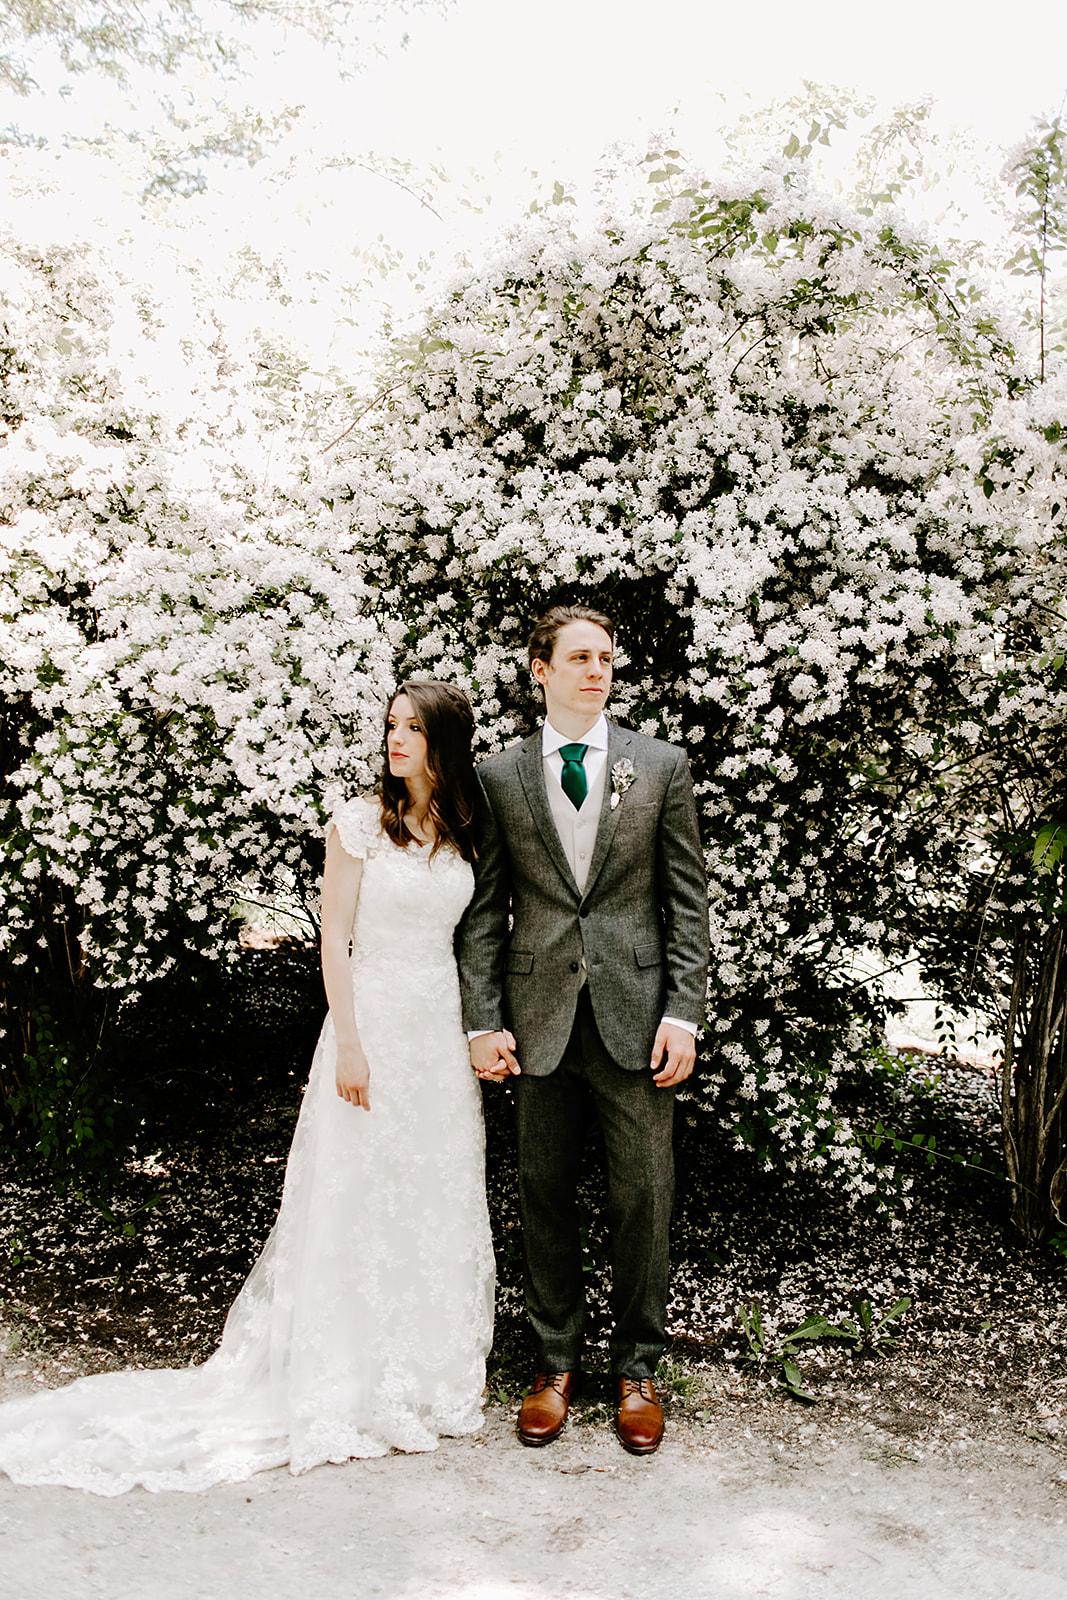 Lily and Easton Wedding Carmel Indiana Cool Creek Park Grace Church Emily Elyse Wehner Photography -276.jpg